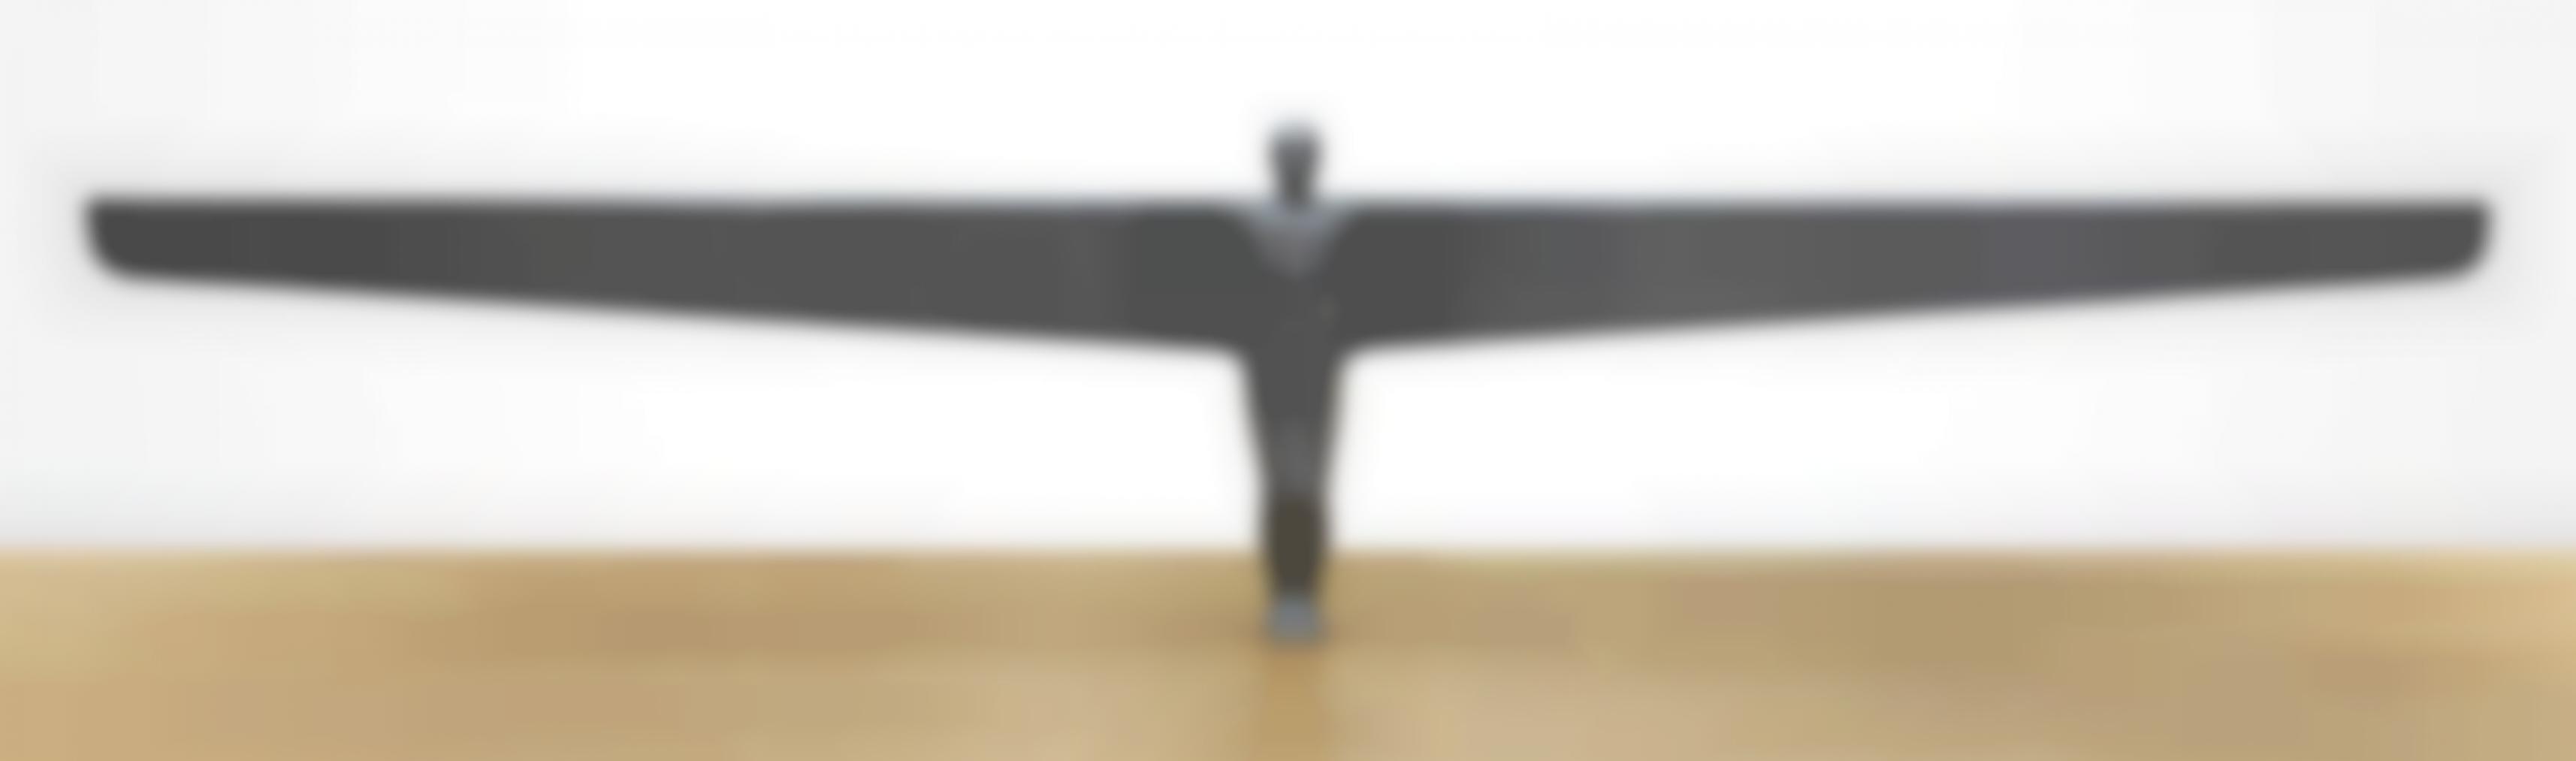 Antony Gormley-A Case For An Angel I-1989